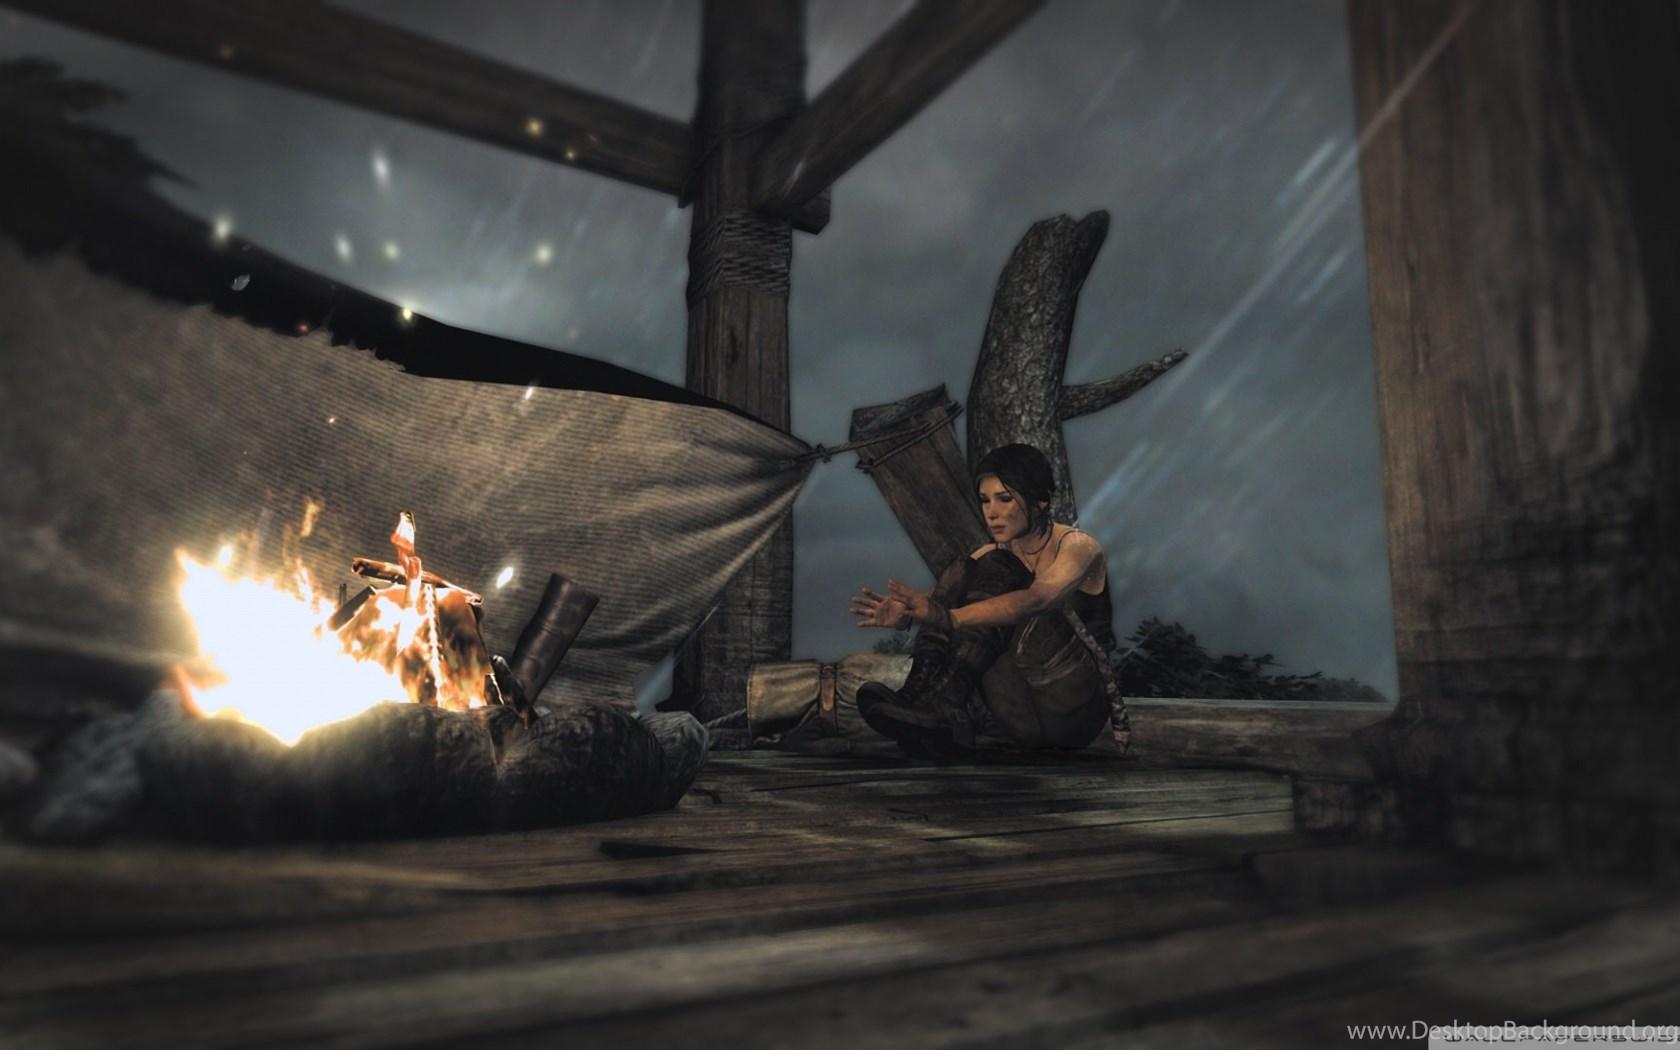 Download Tomb Raider 2013 Game Wallpapers 1920x1080 Desktop Background